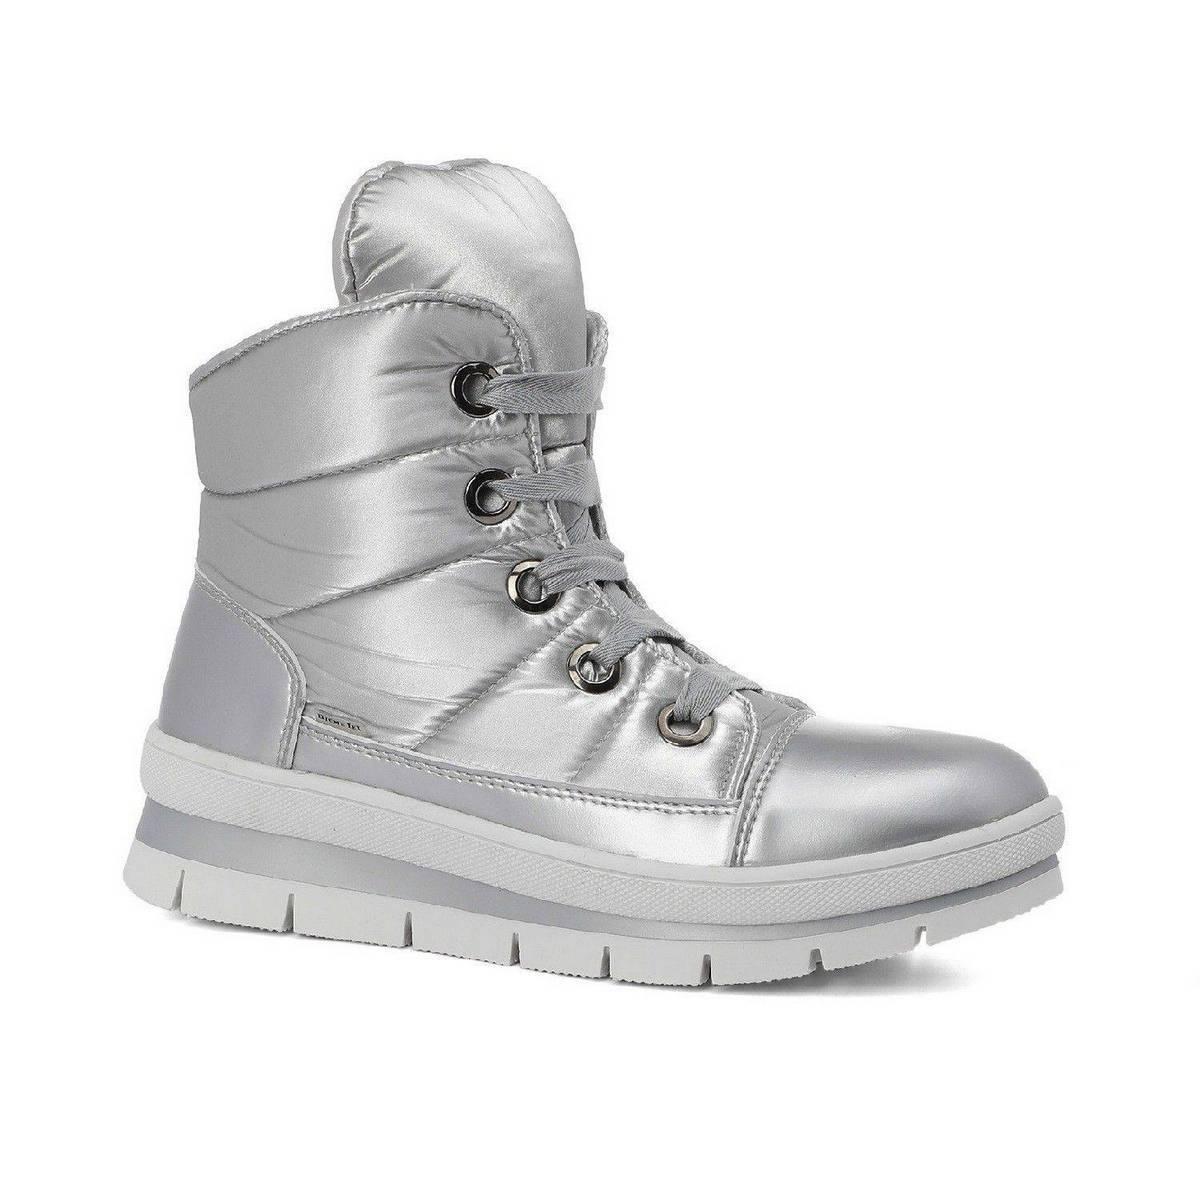 Ботинки Jog Dog Moon Walker (серебряный флэш)